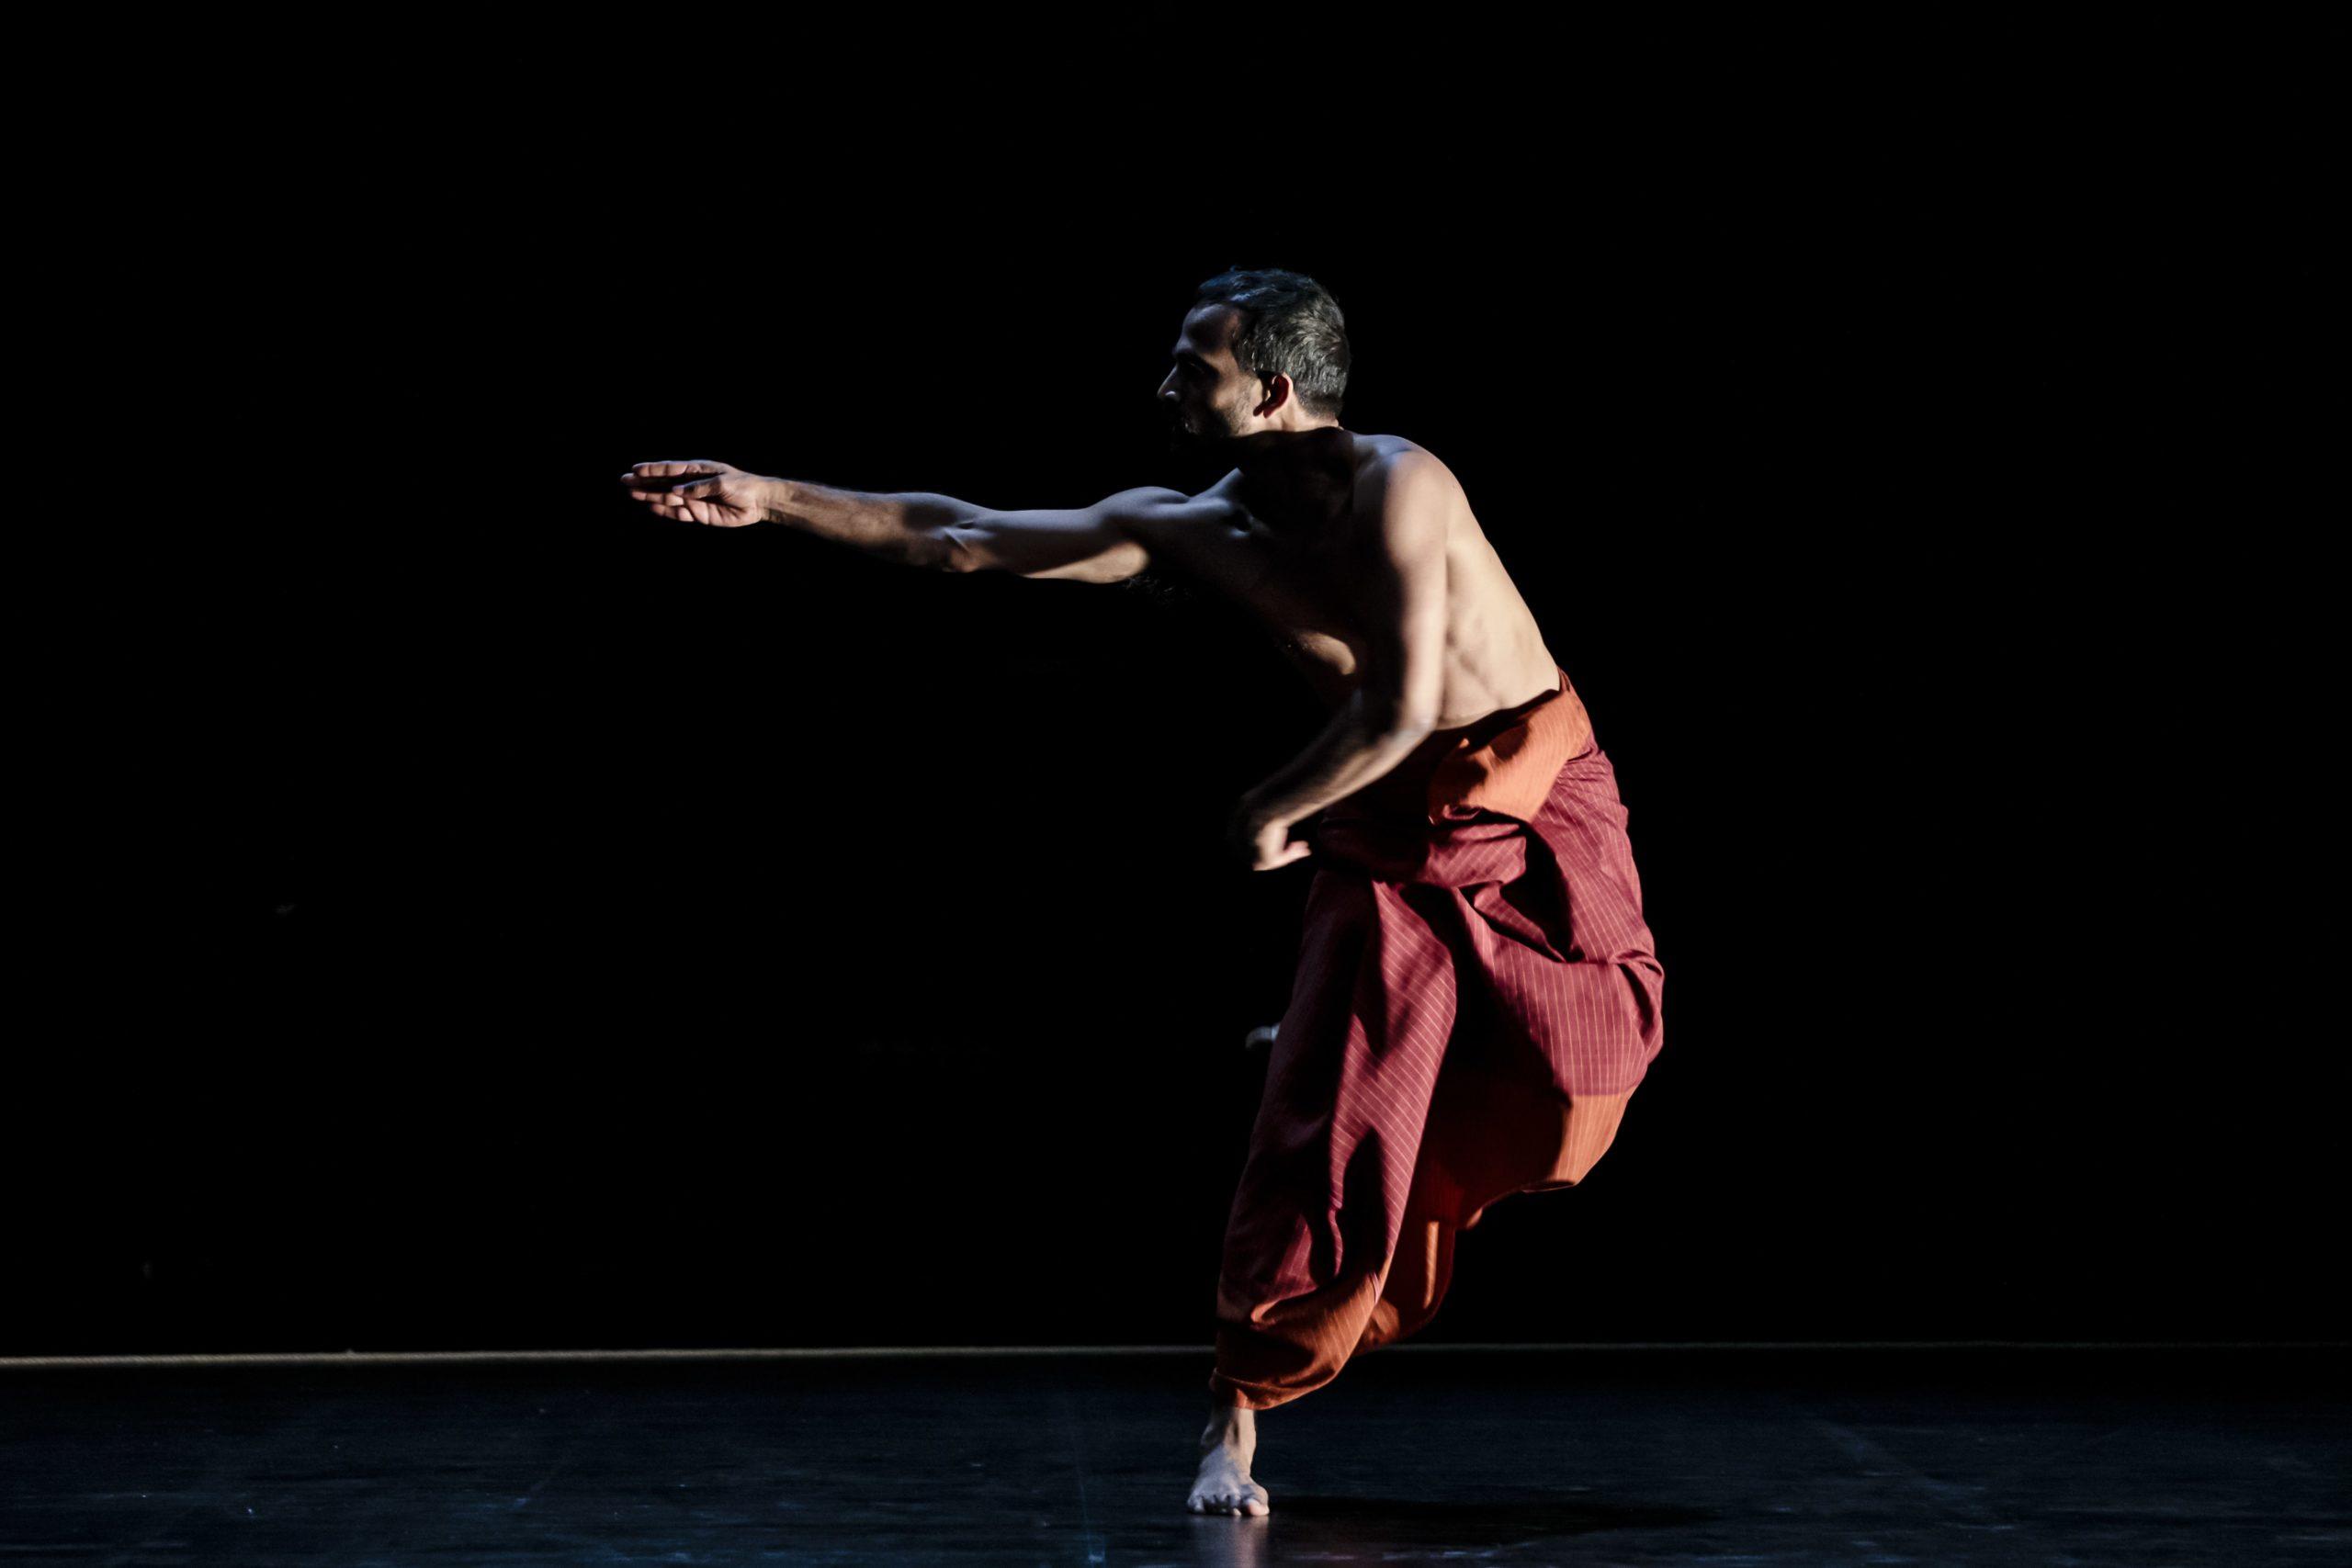 3 danse de voyage HD BriceROBERT min